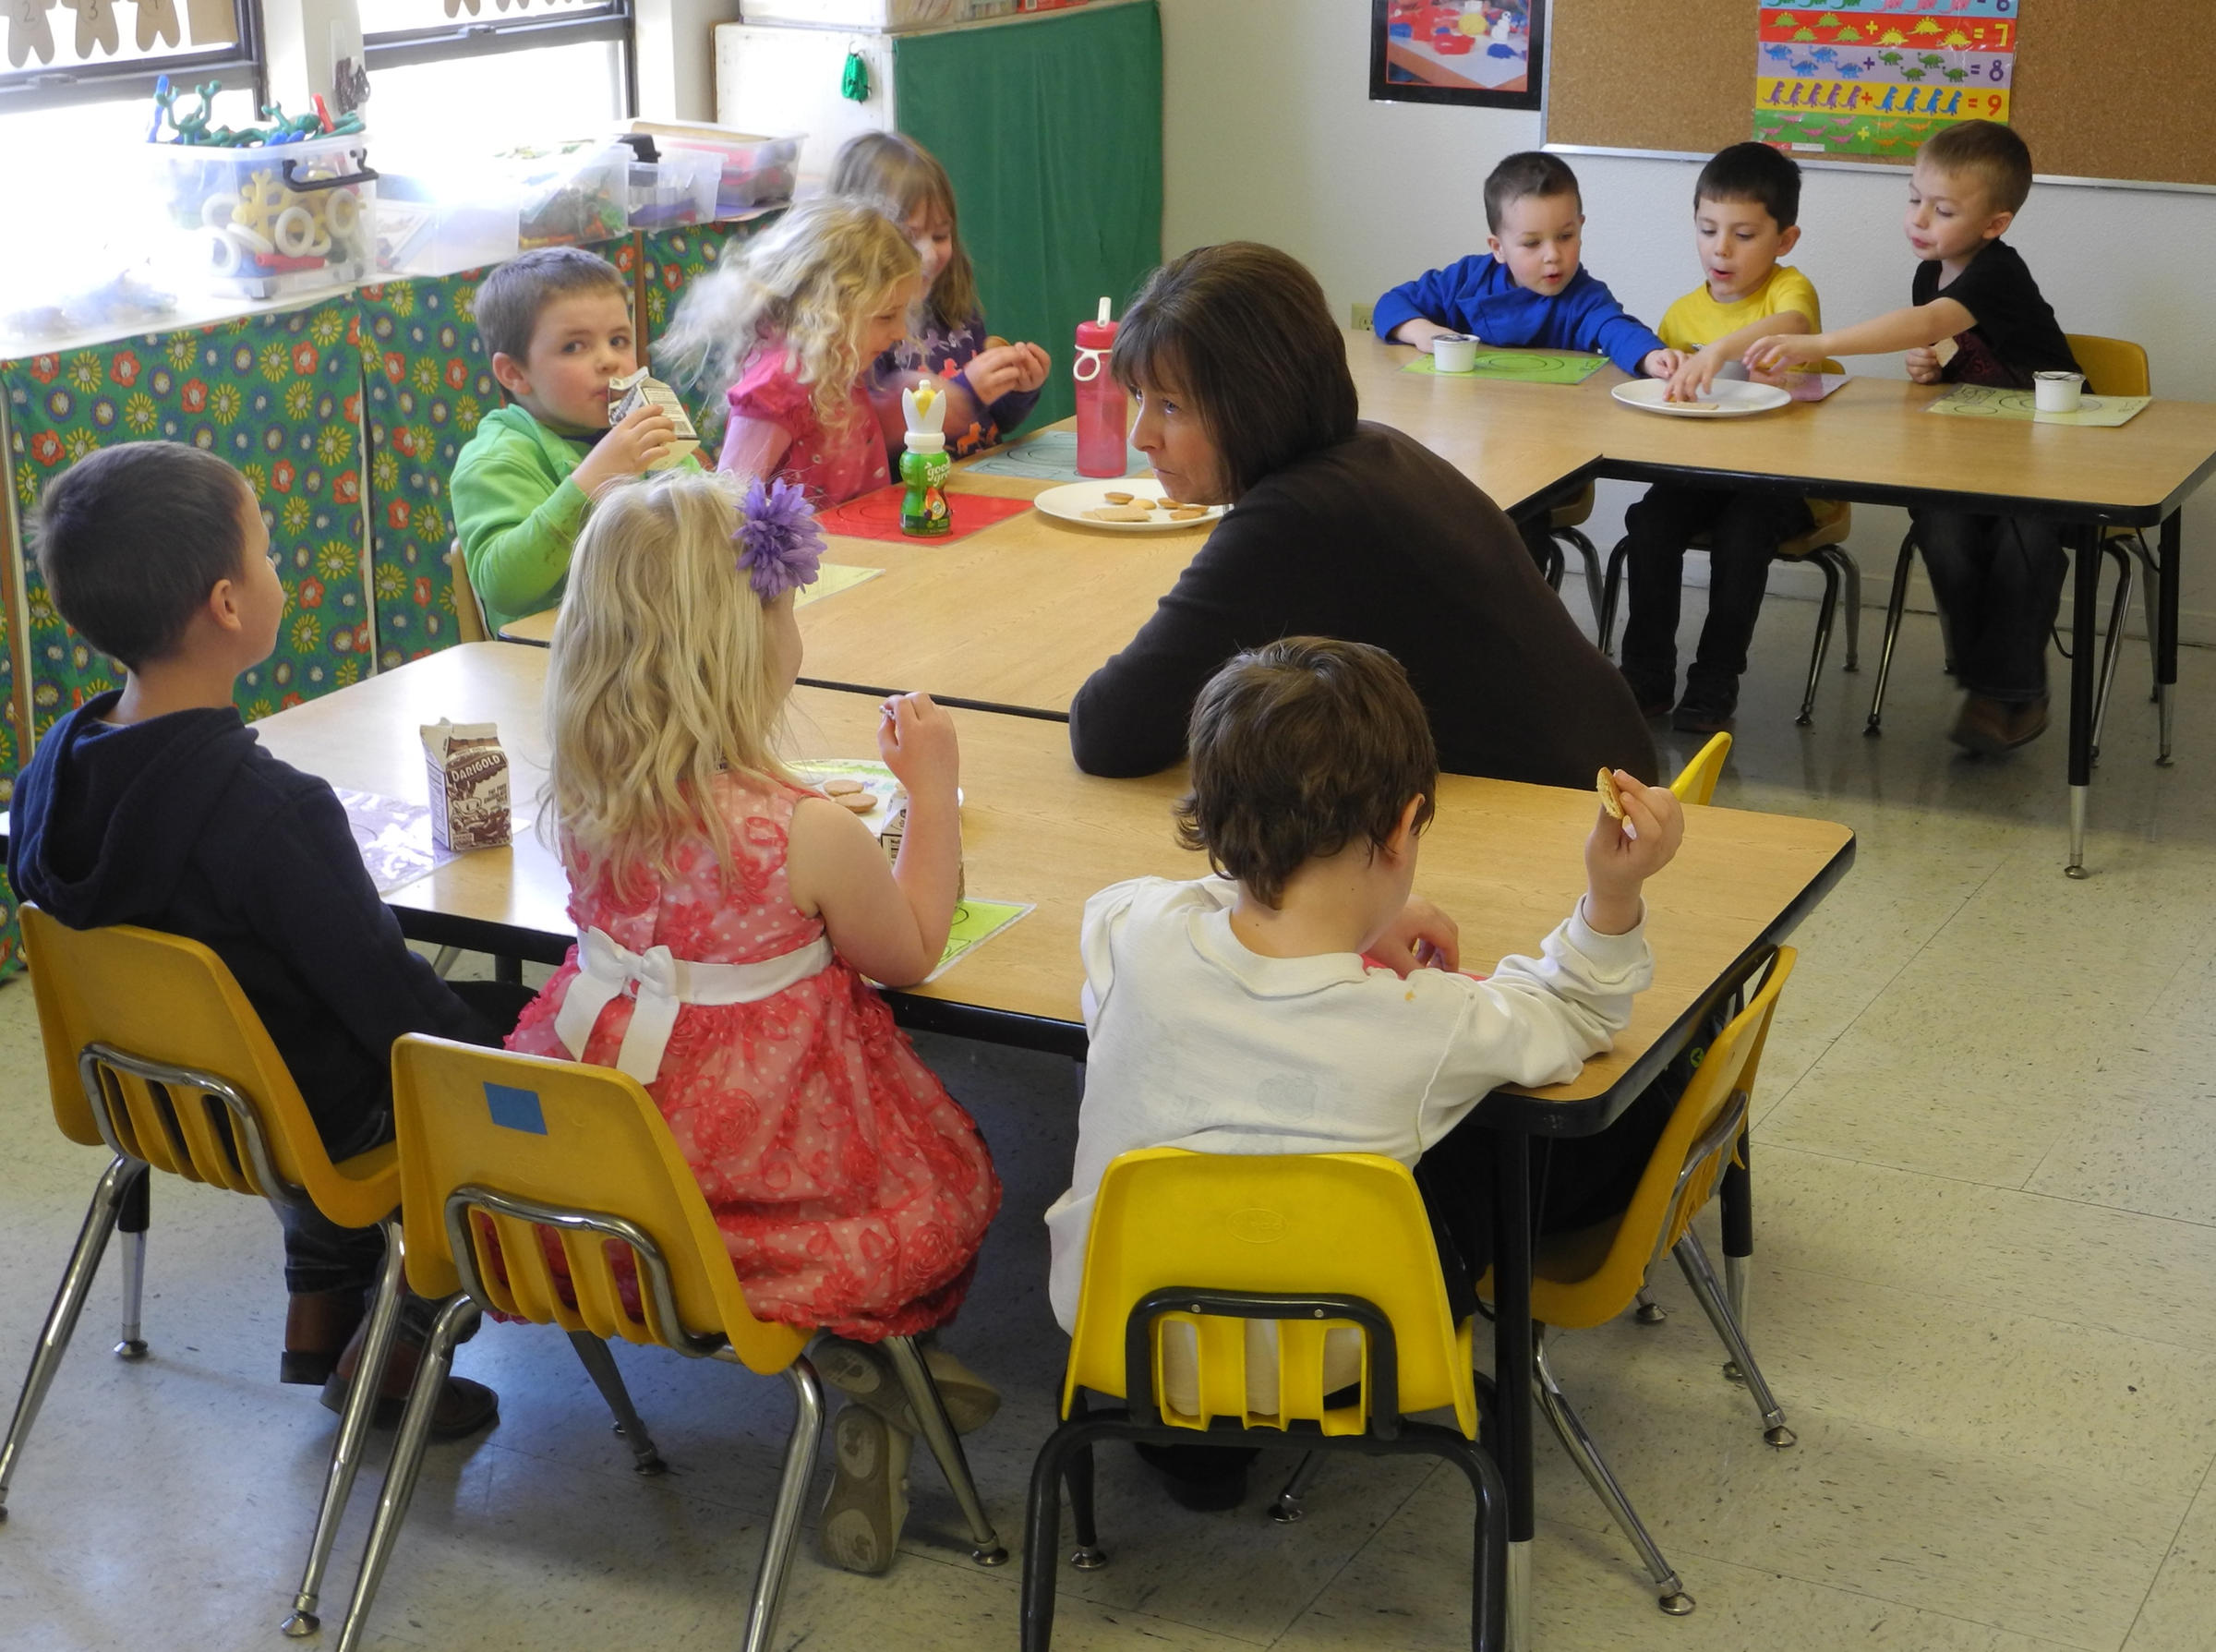 Two Idaho Republicans Pitch Preschool Pilot Program Dubbed